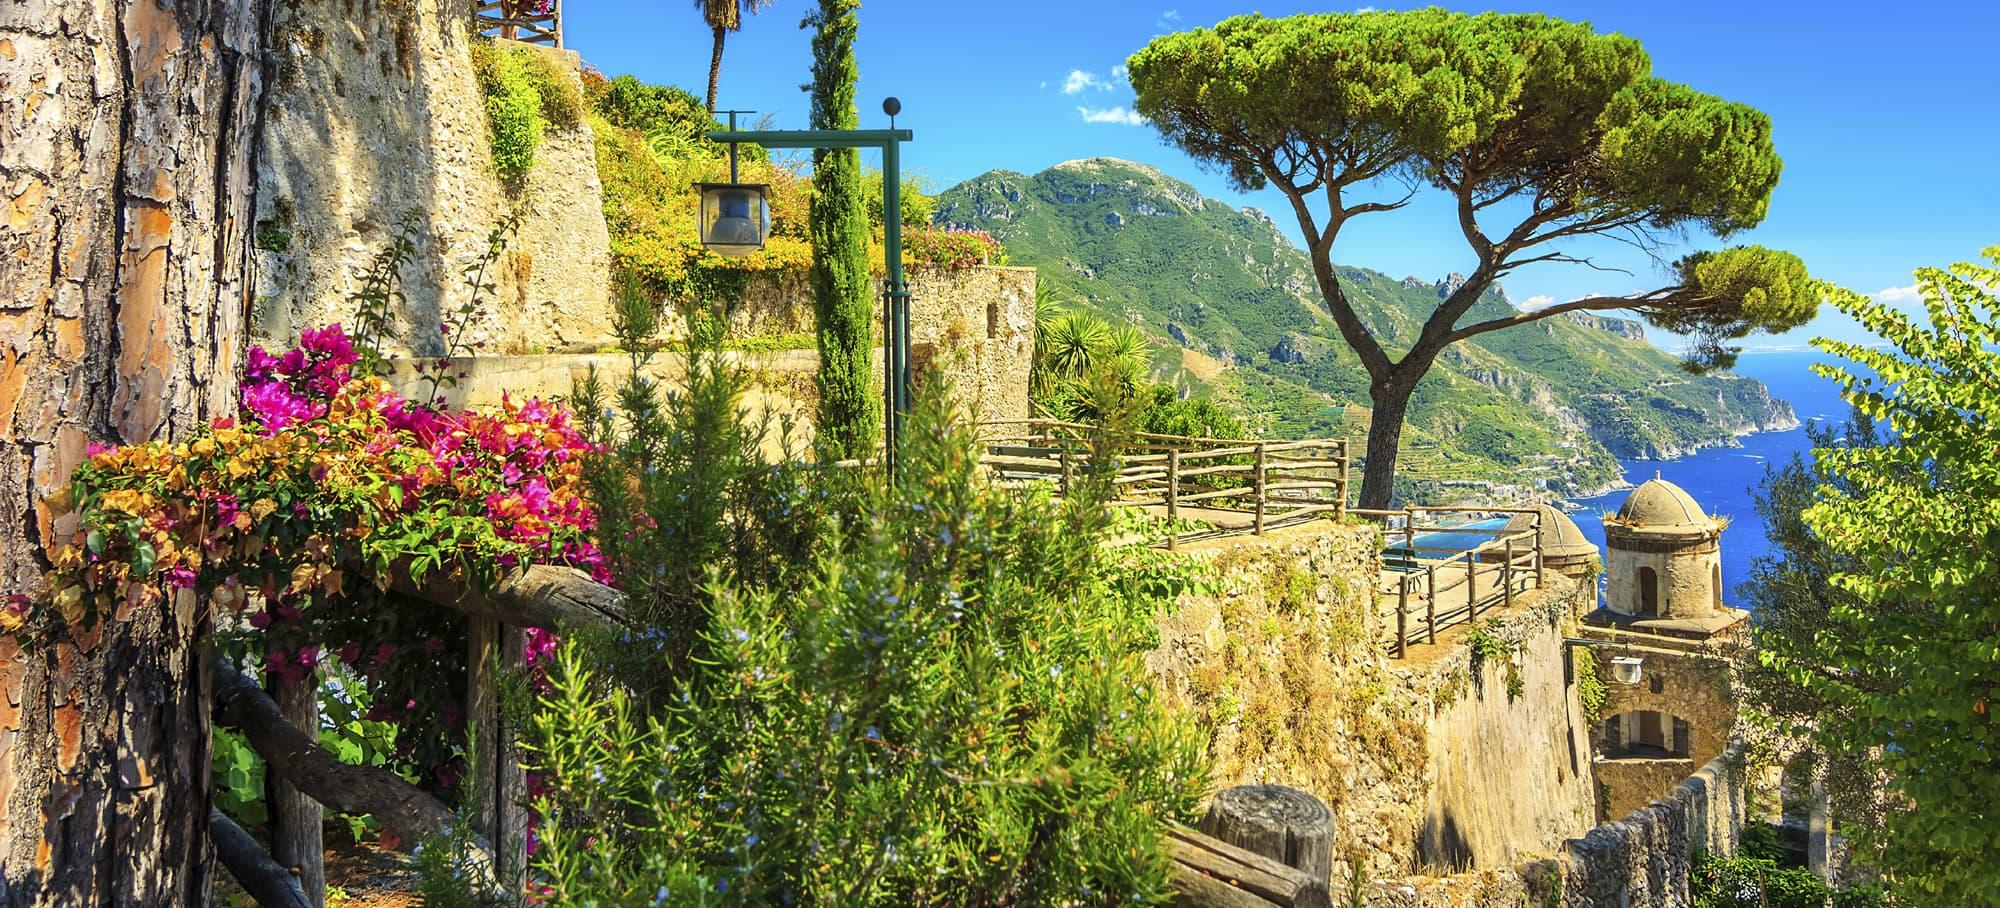 Hotel per Famiglie Costiera Amalfitana